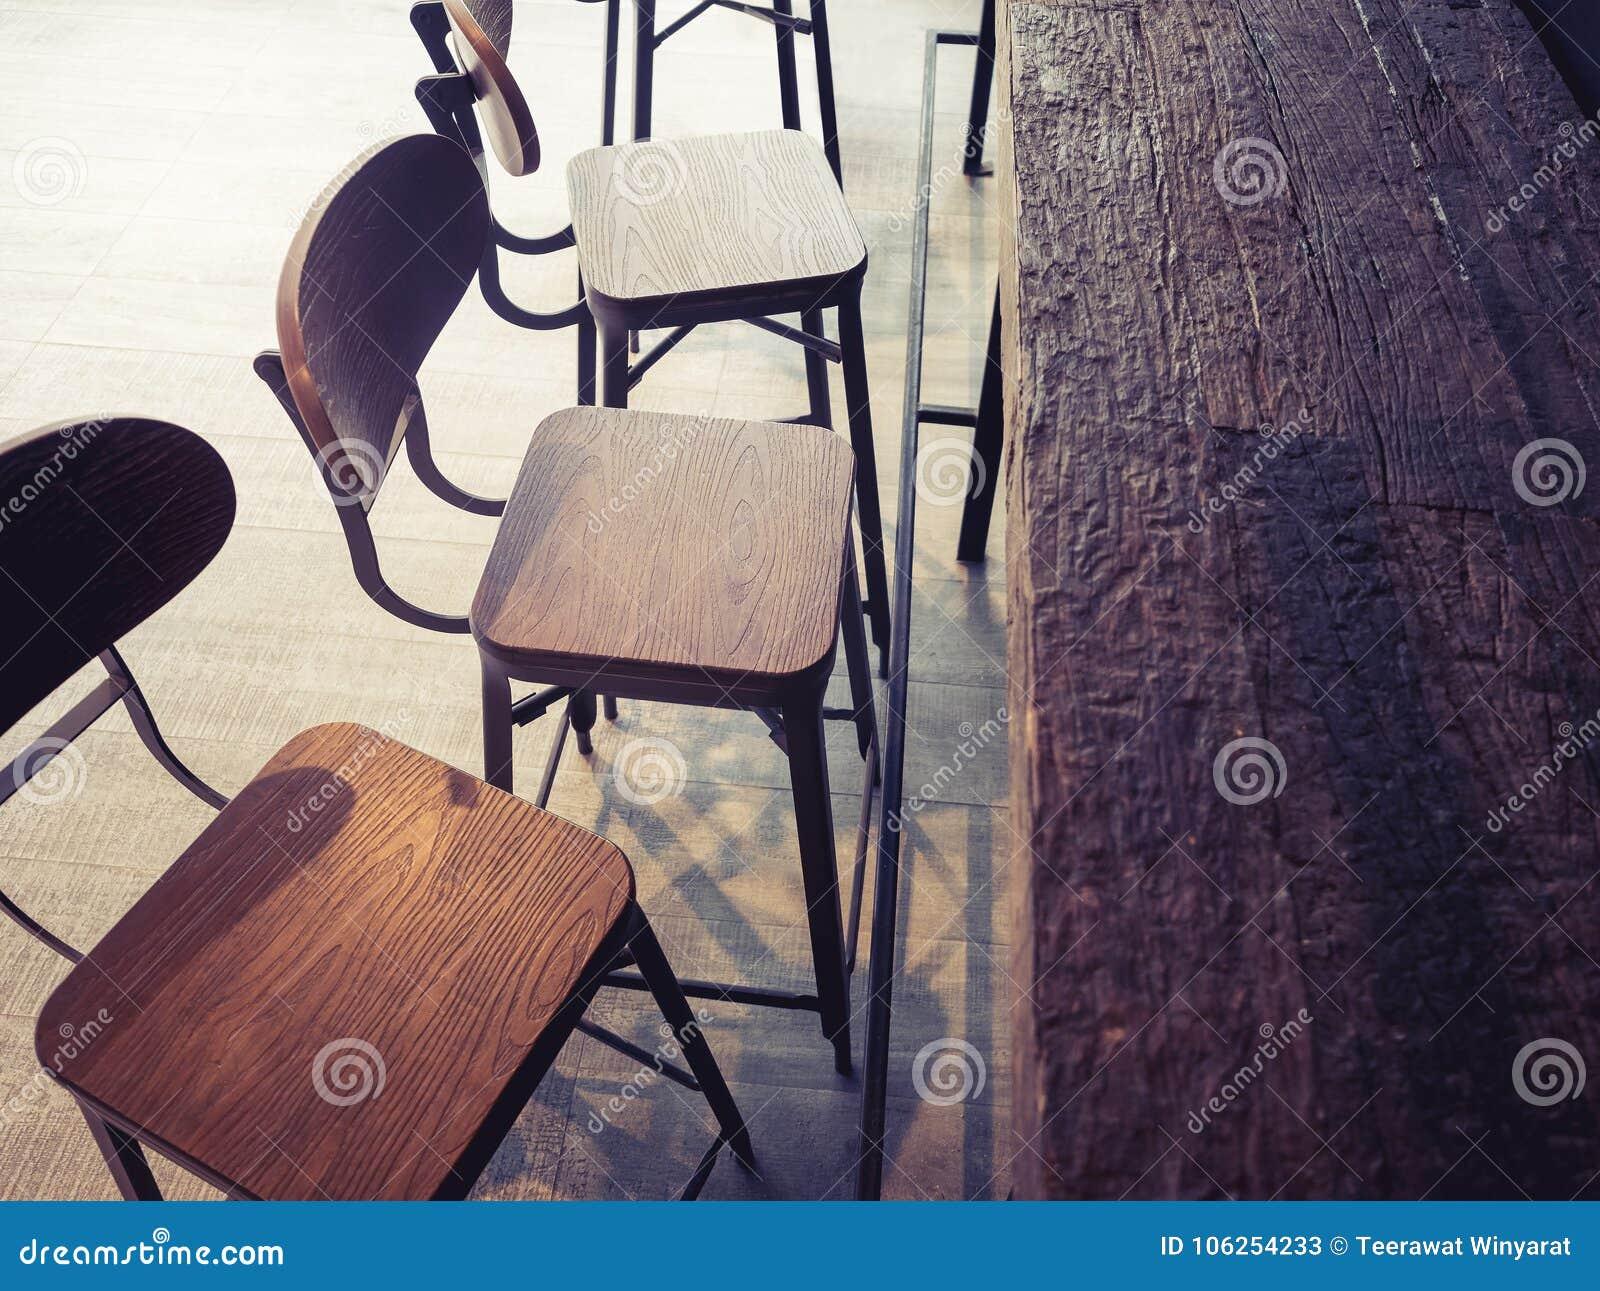 Peachy Cafe Counter Chairs Seats Restaurant Cafe Vintage Retro Creativecarmelina Interior Chair Design Creativecarmelinacom